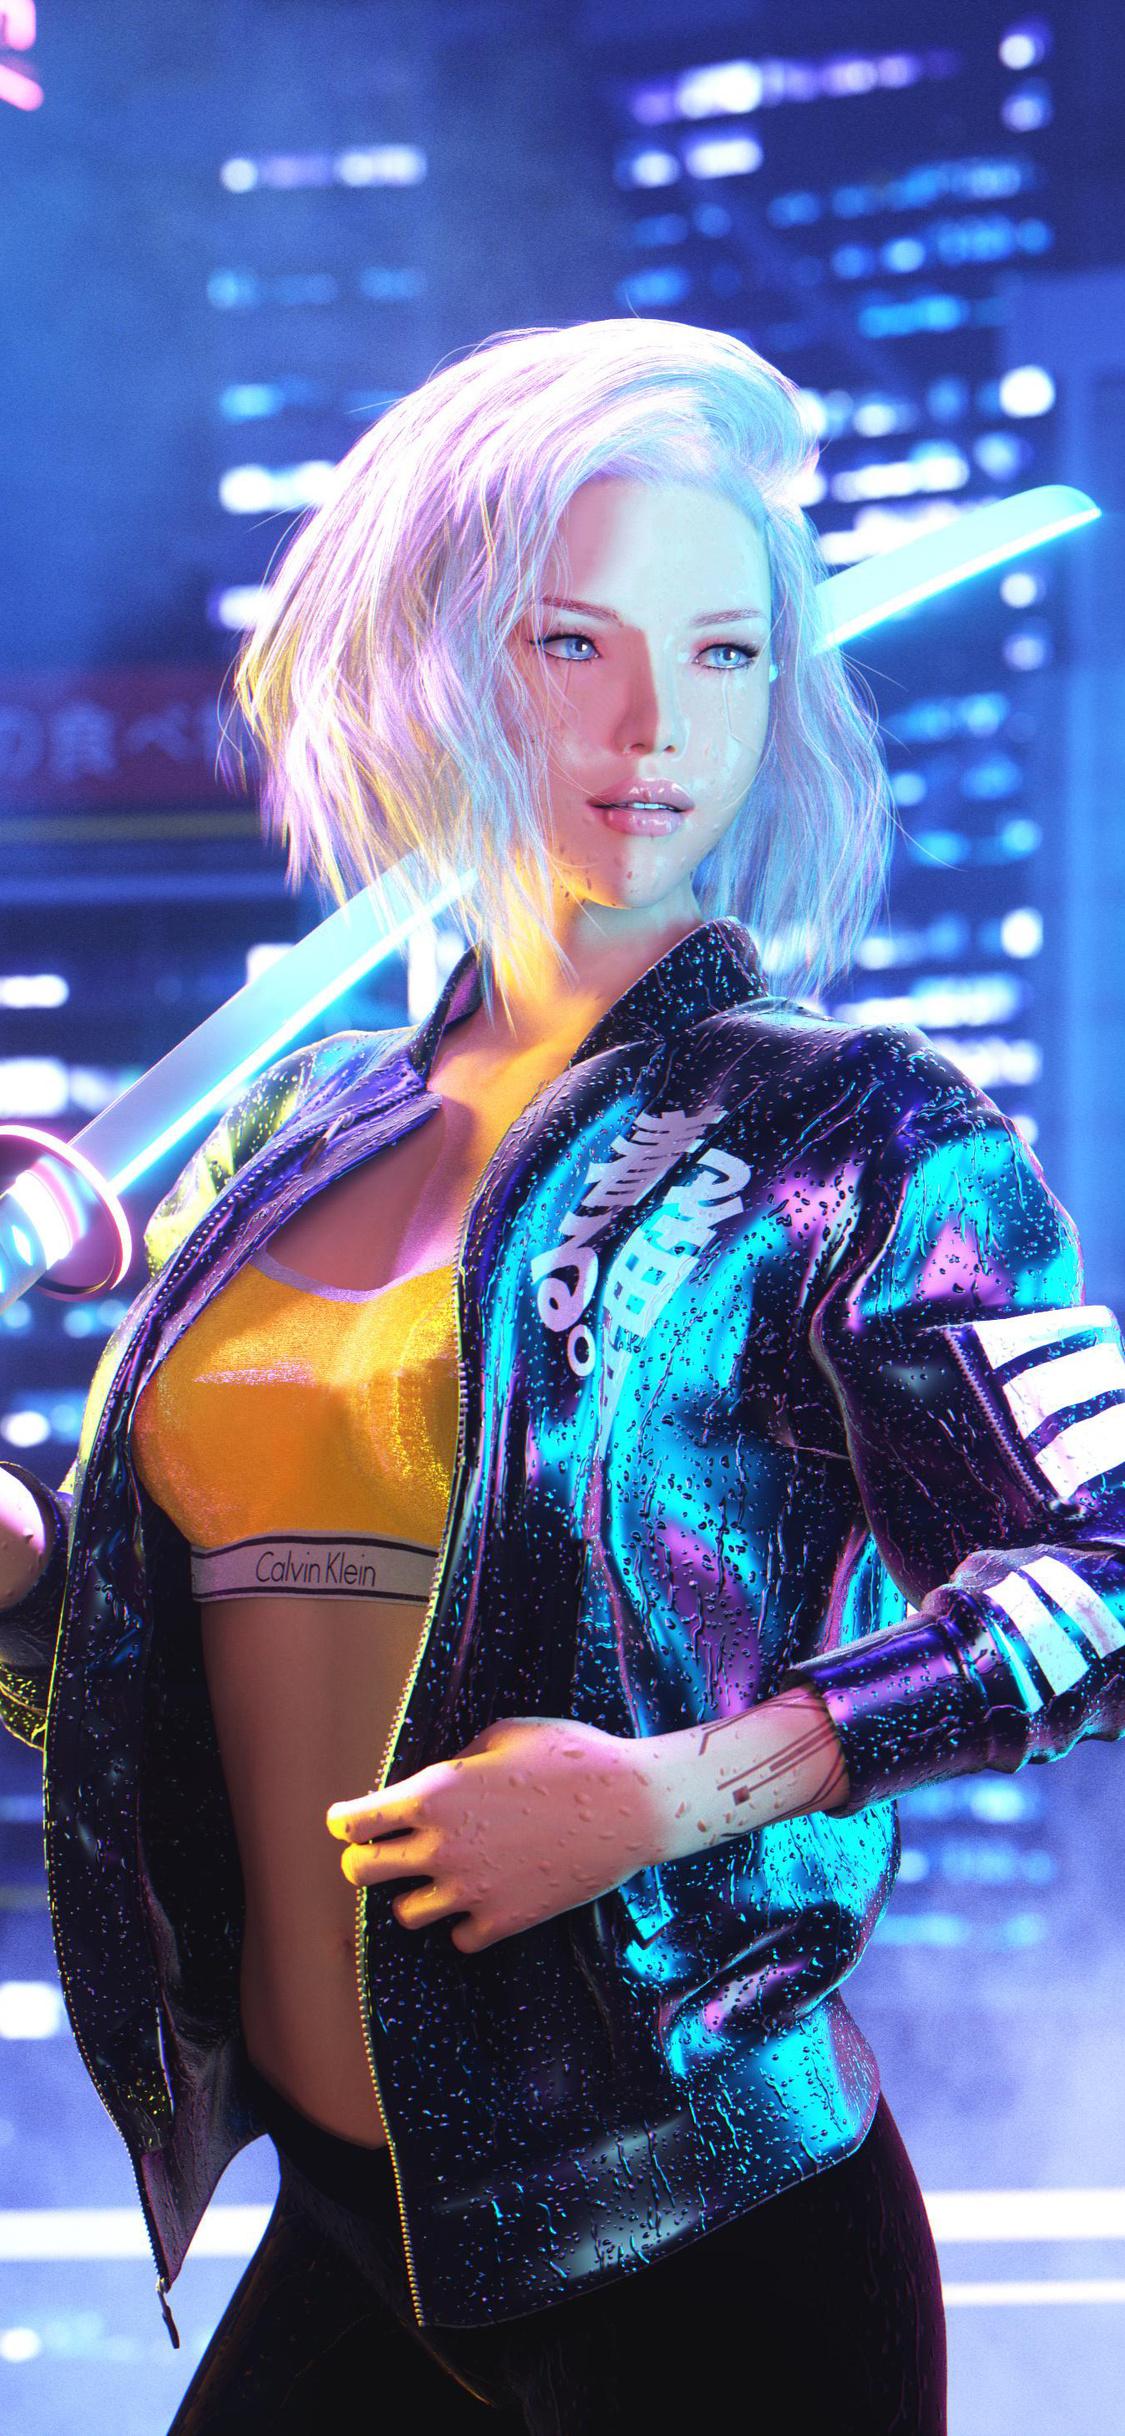 1125x2436 Cyberpunk 2077 Girl 4k 2020 Iphone XS,Iphone 10 ...